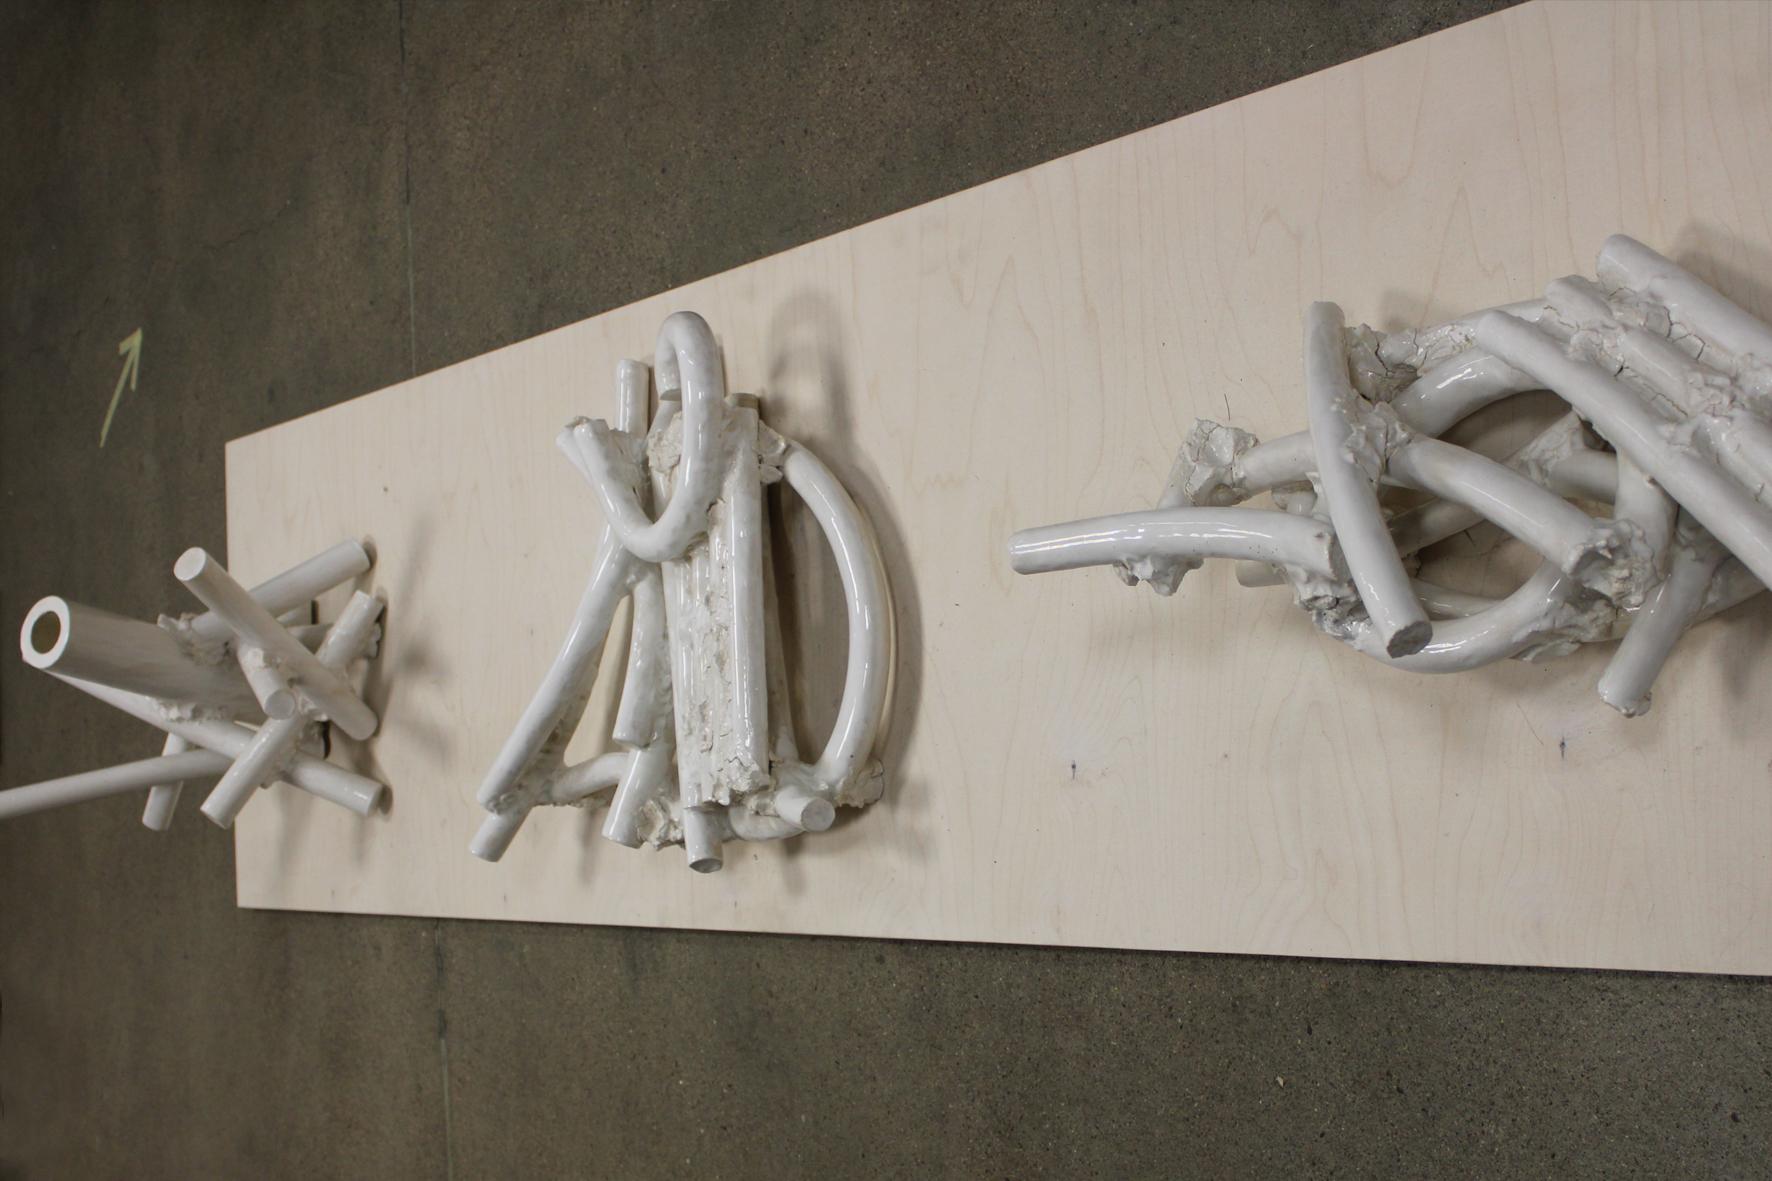 4.10.20, Keramik - Silber, Hildesheim